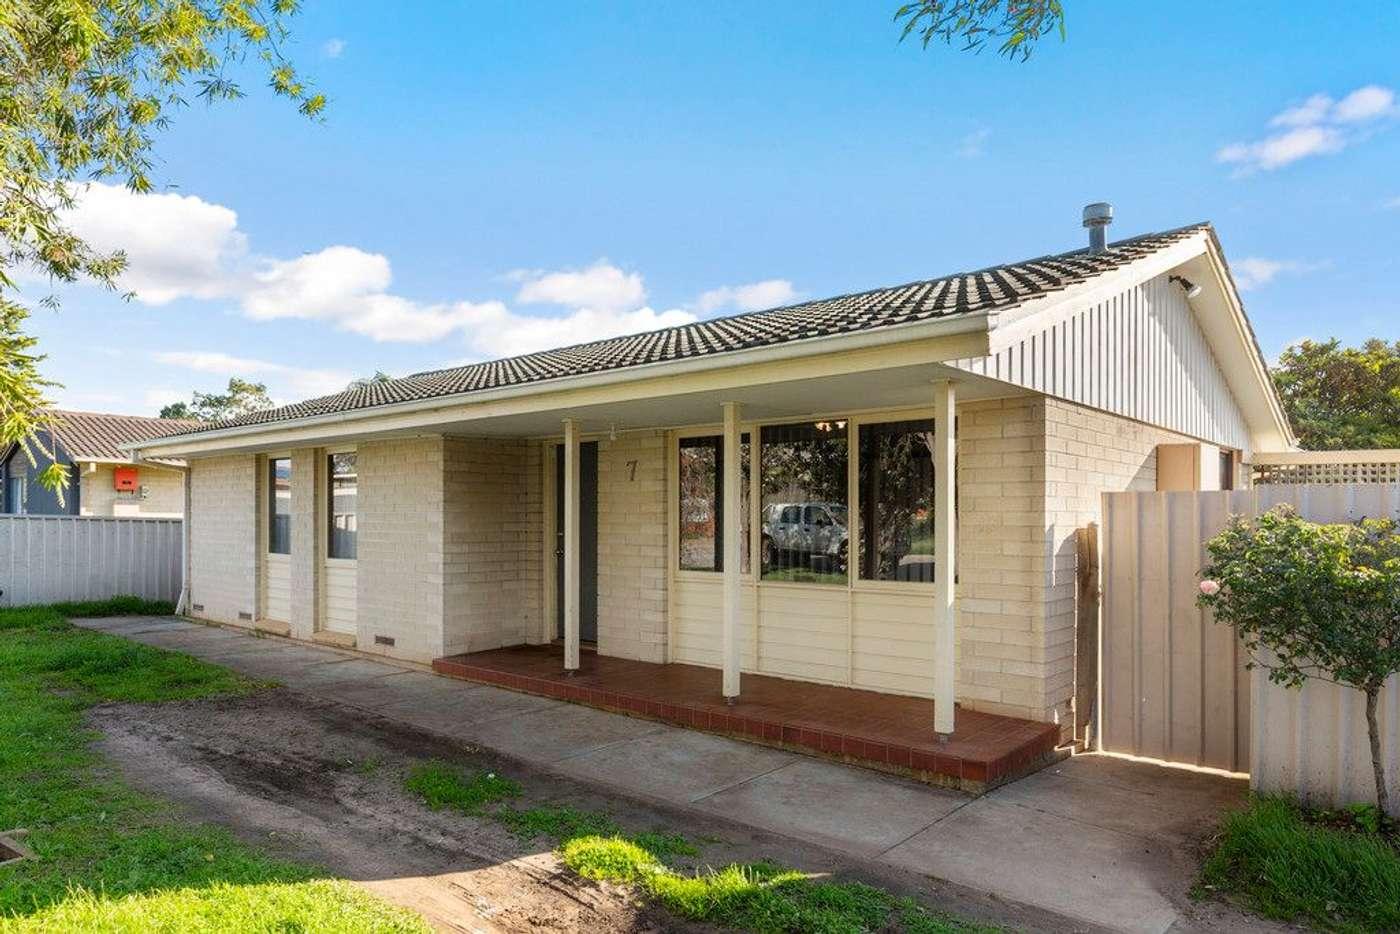 Main view of Homely house listing, 7 Marana Avenue, Morphett Vale SA 5162